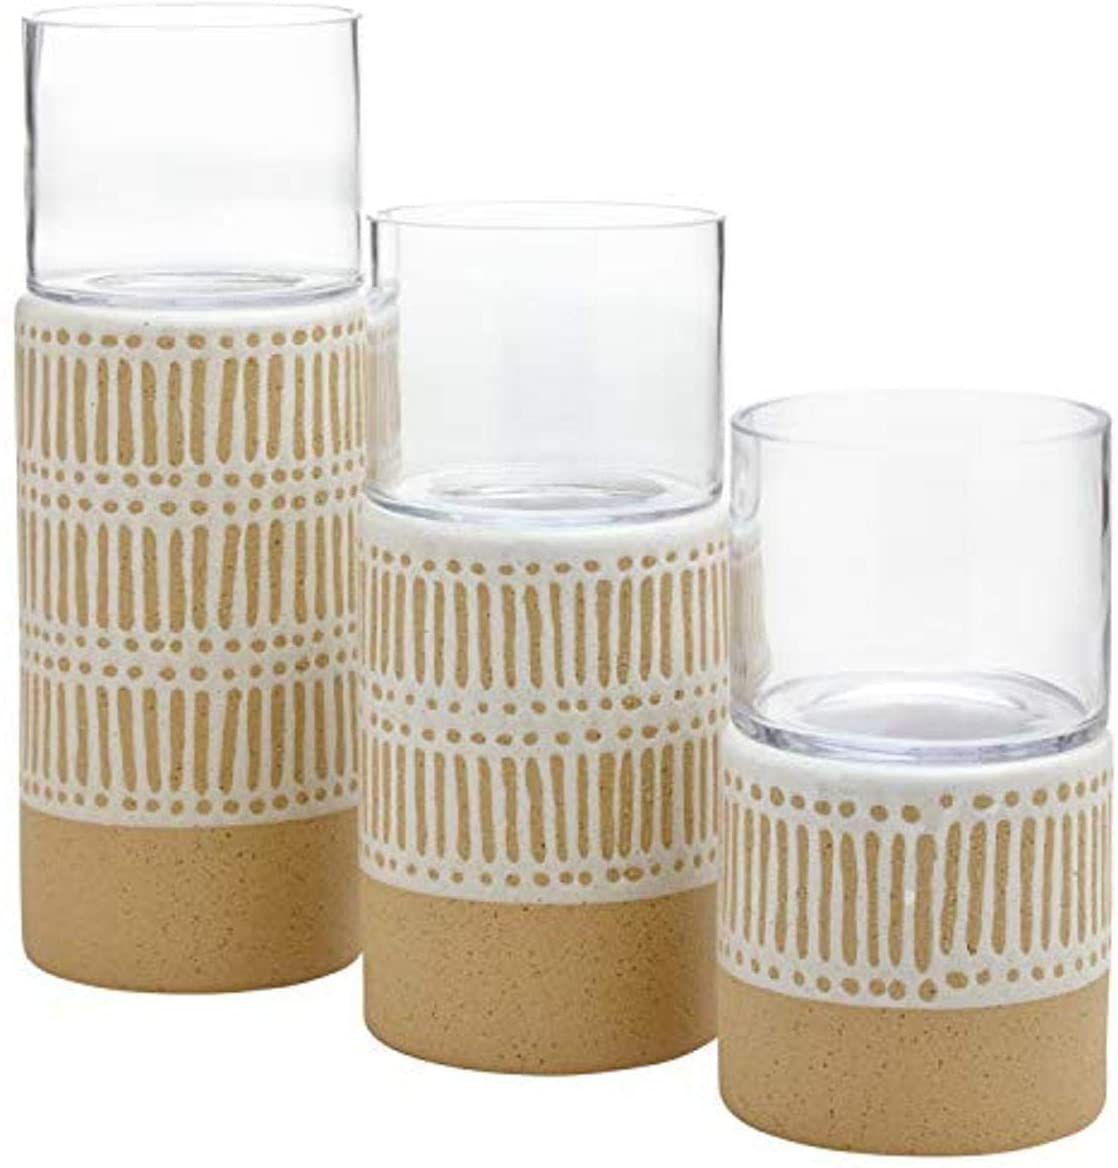 Stone & Beam Emerick Glass Vases (Set of 3)